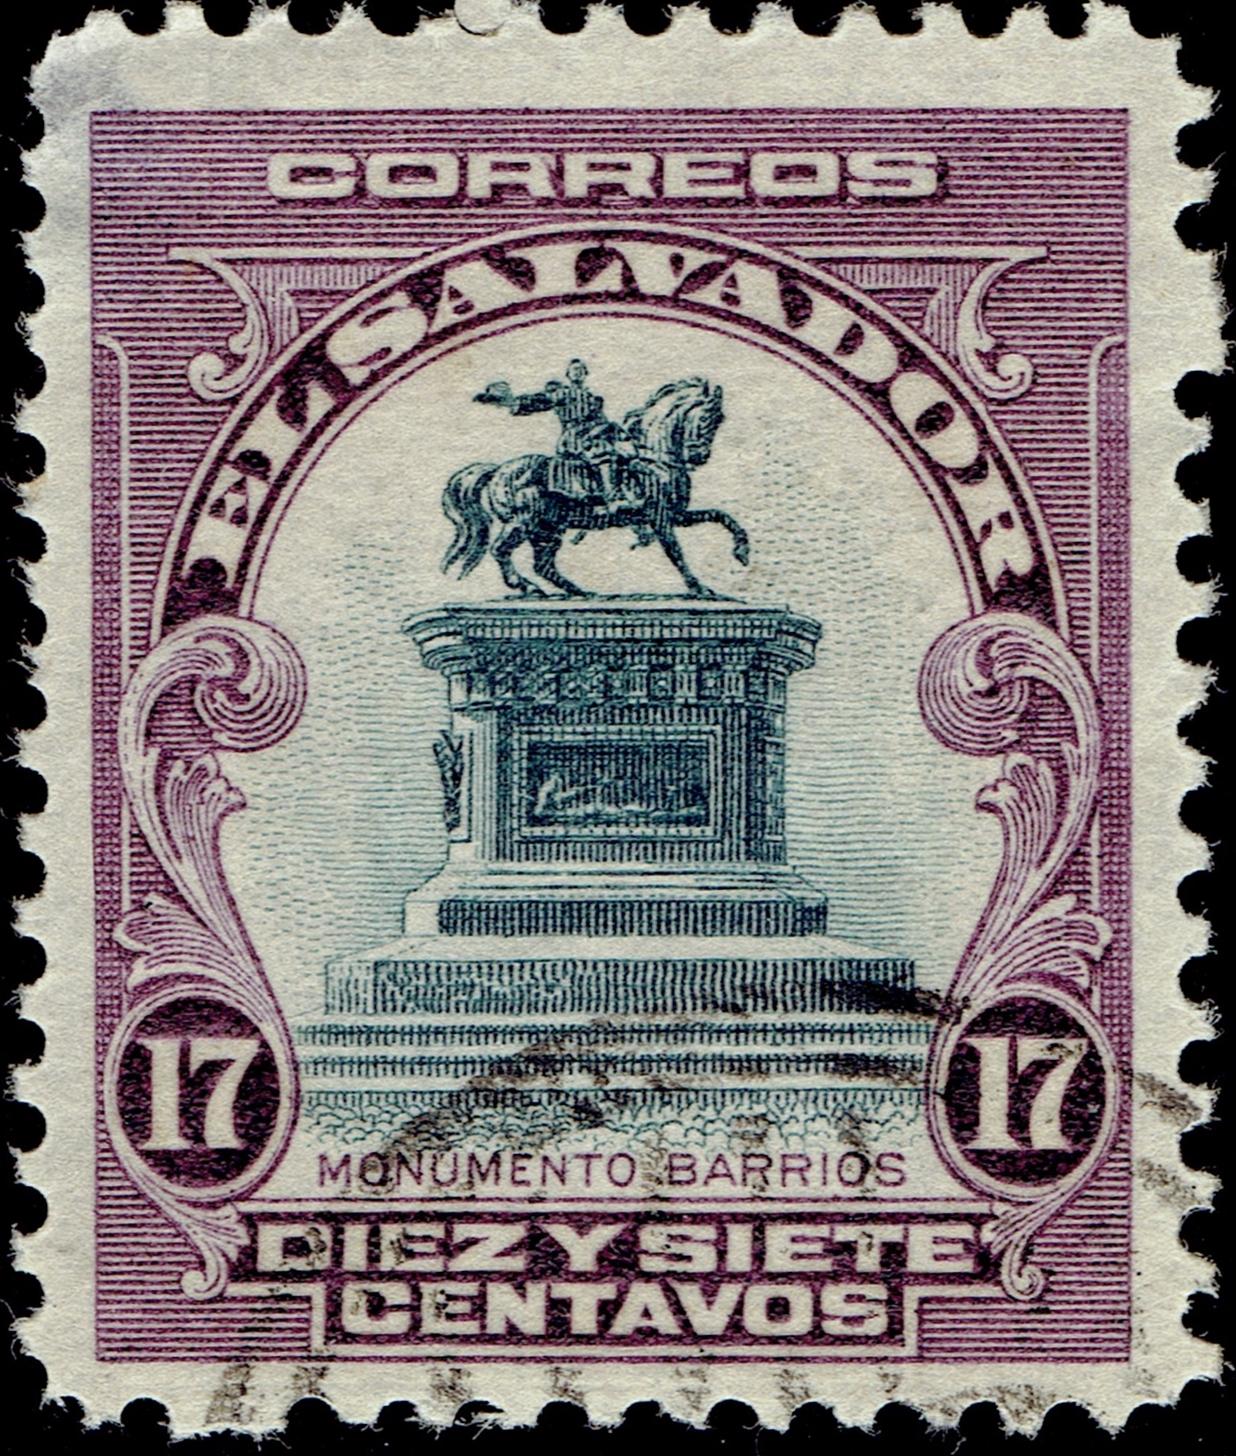 El Salvador #407 (1912)